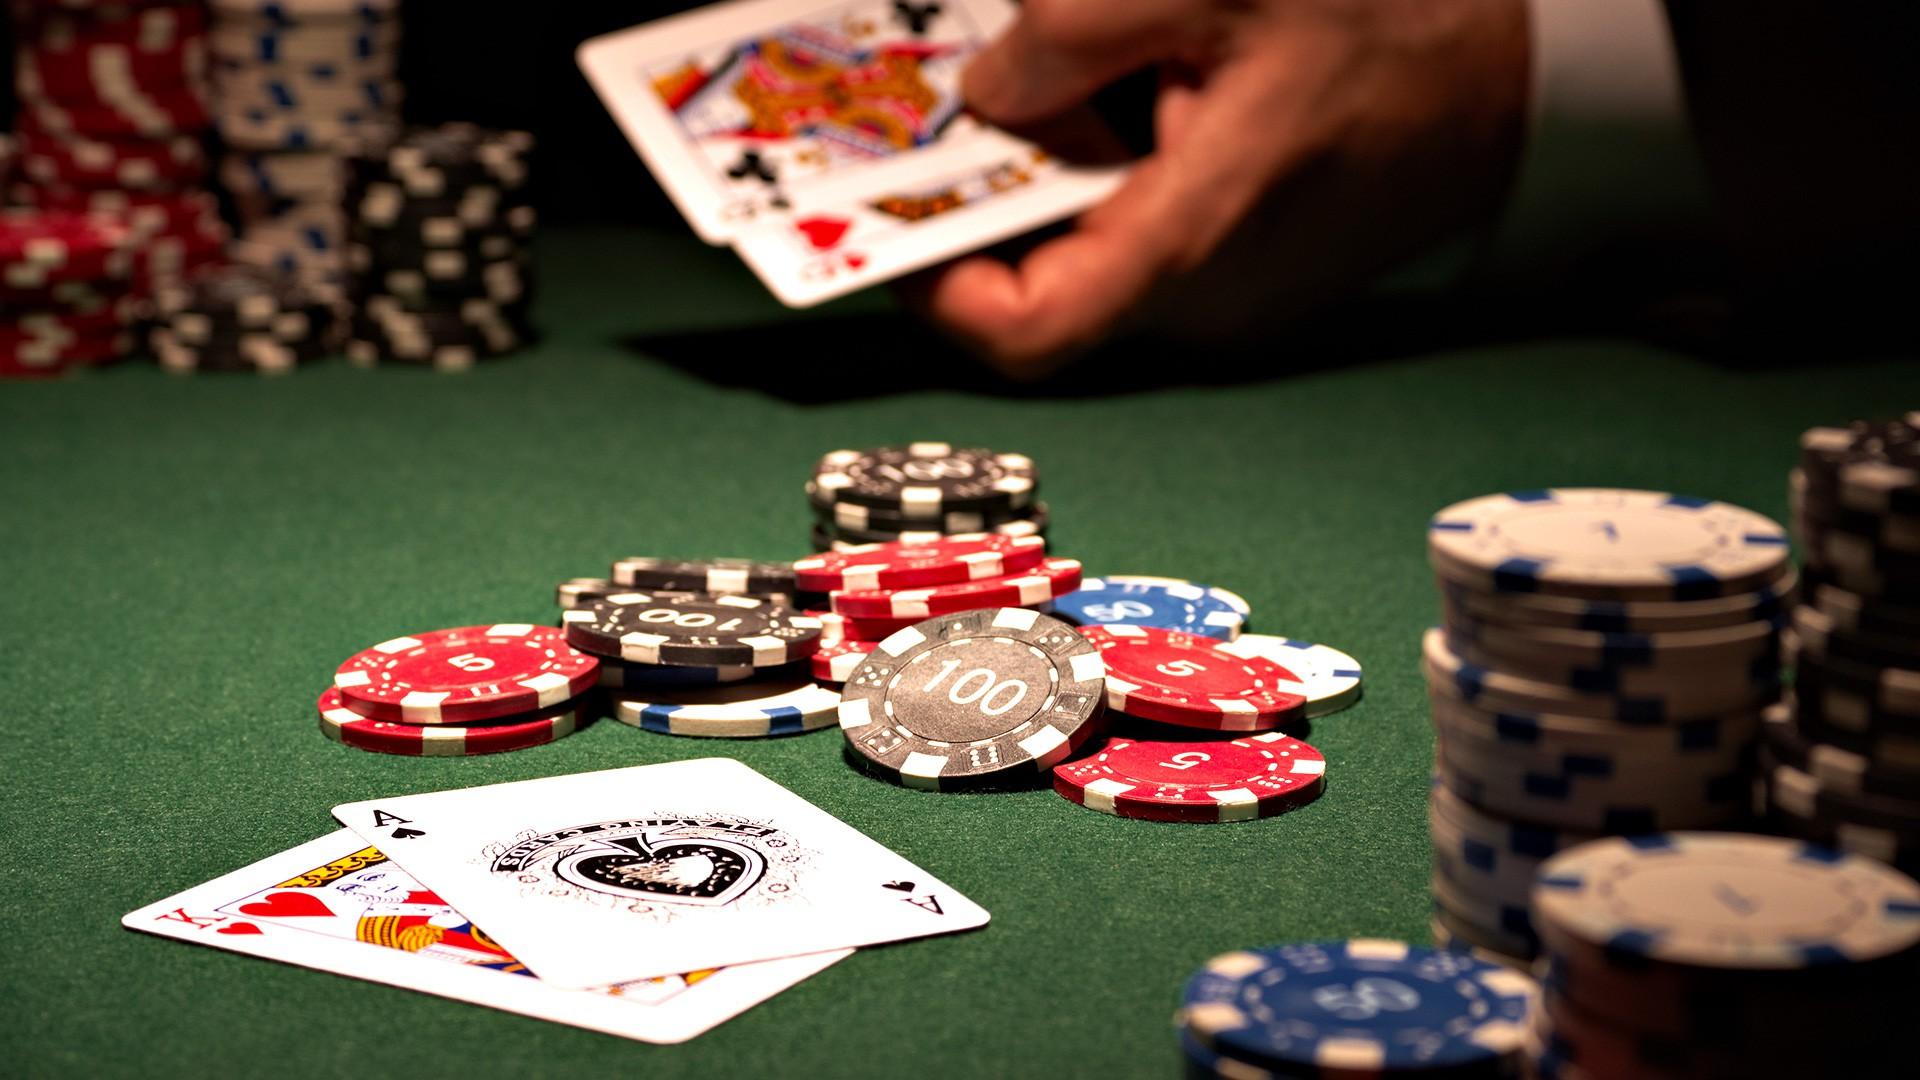 Покер автомати гральні онлайн онлайн видеочат рулетка с девушками 18 лет бесплатно